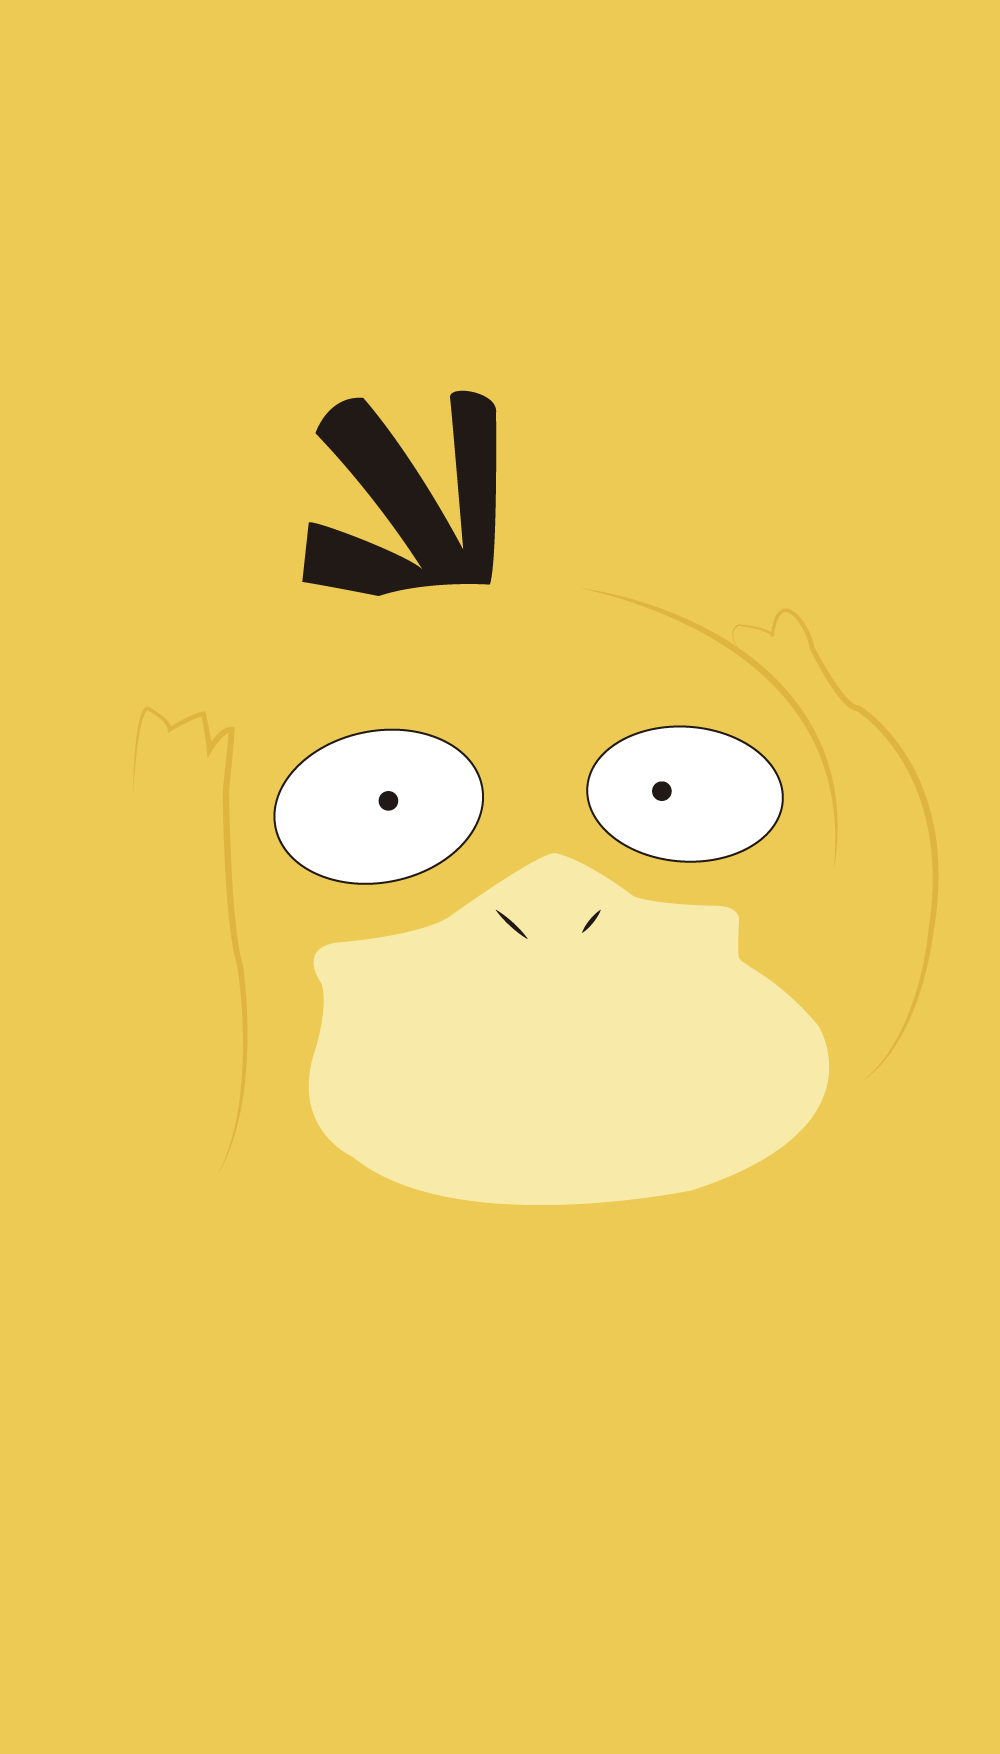 Original Psyduck Laddyのイラスト Pokemon Pikachu Wallpaper